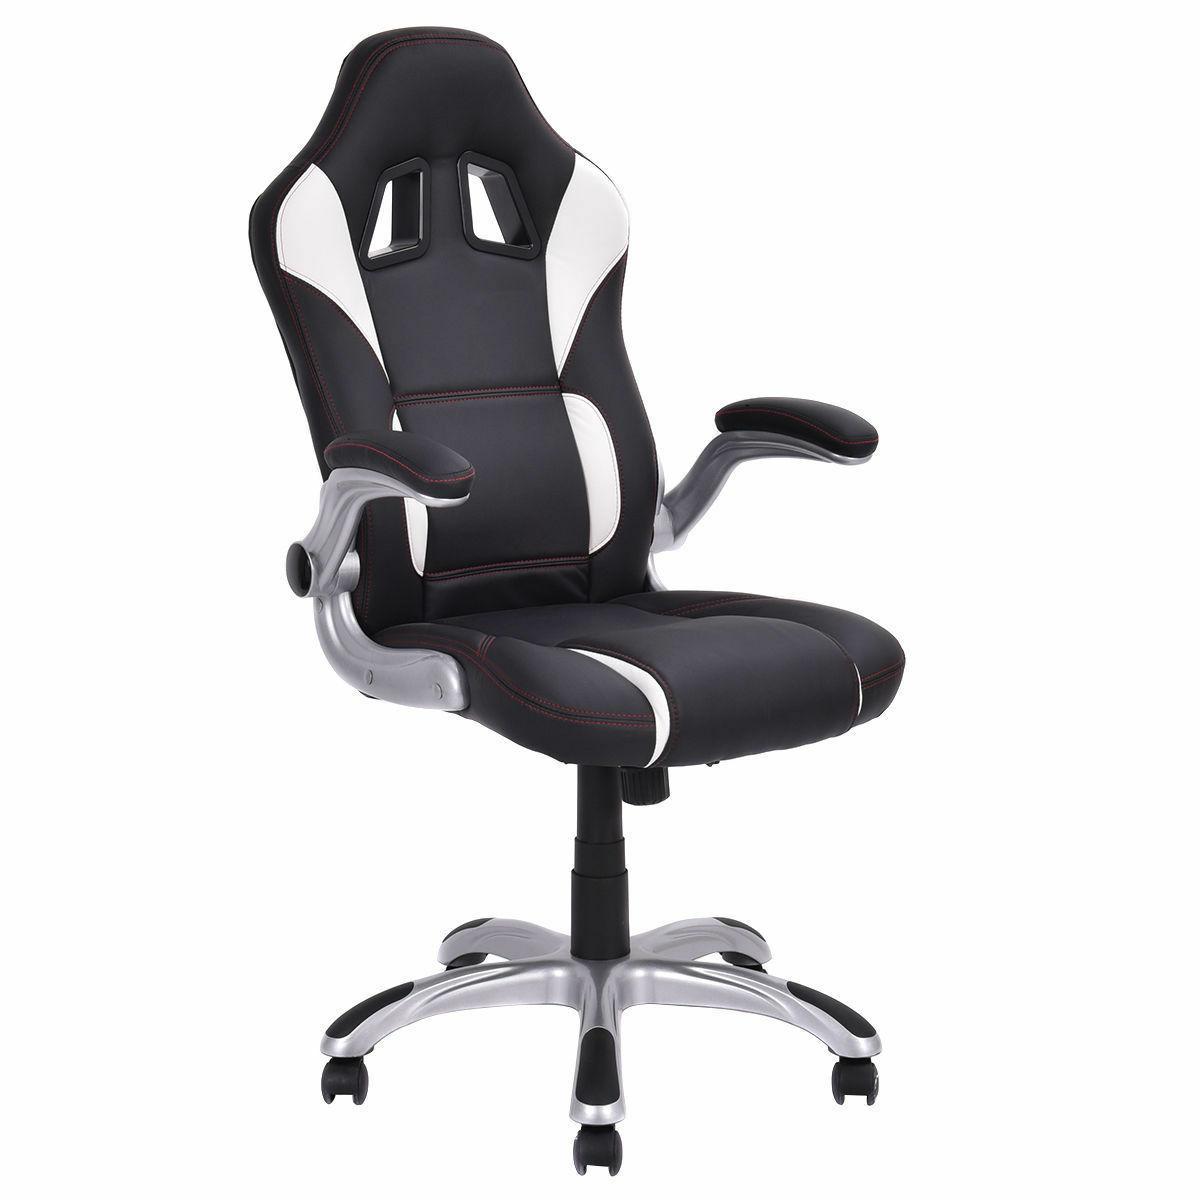 Racing Chair Gaming